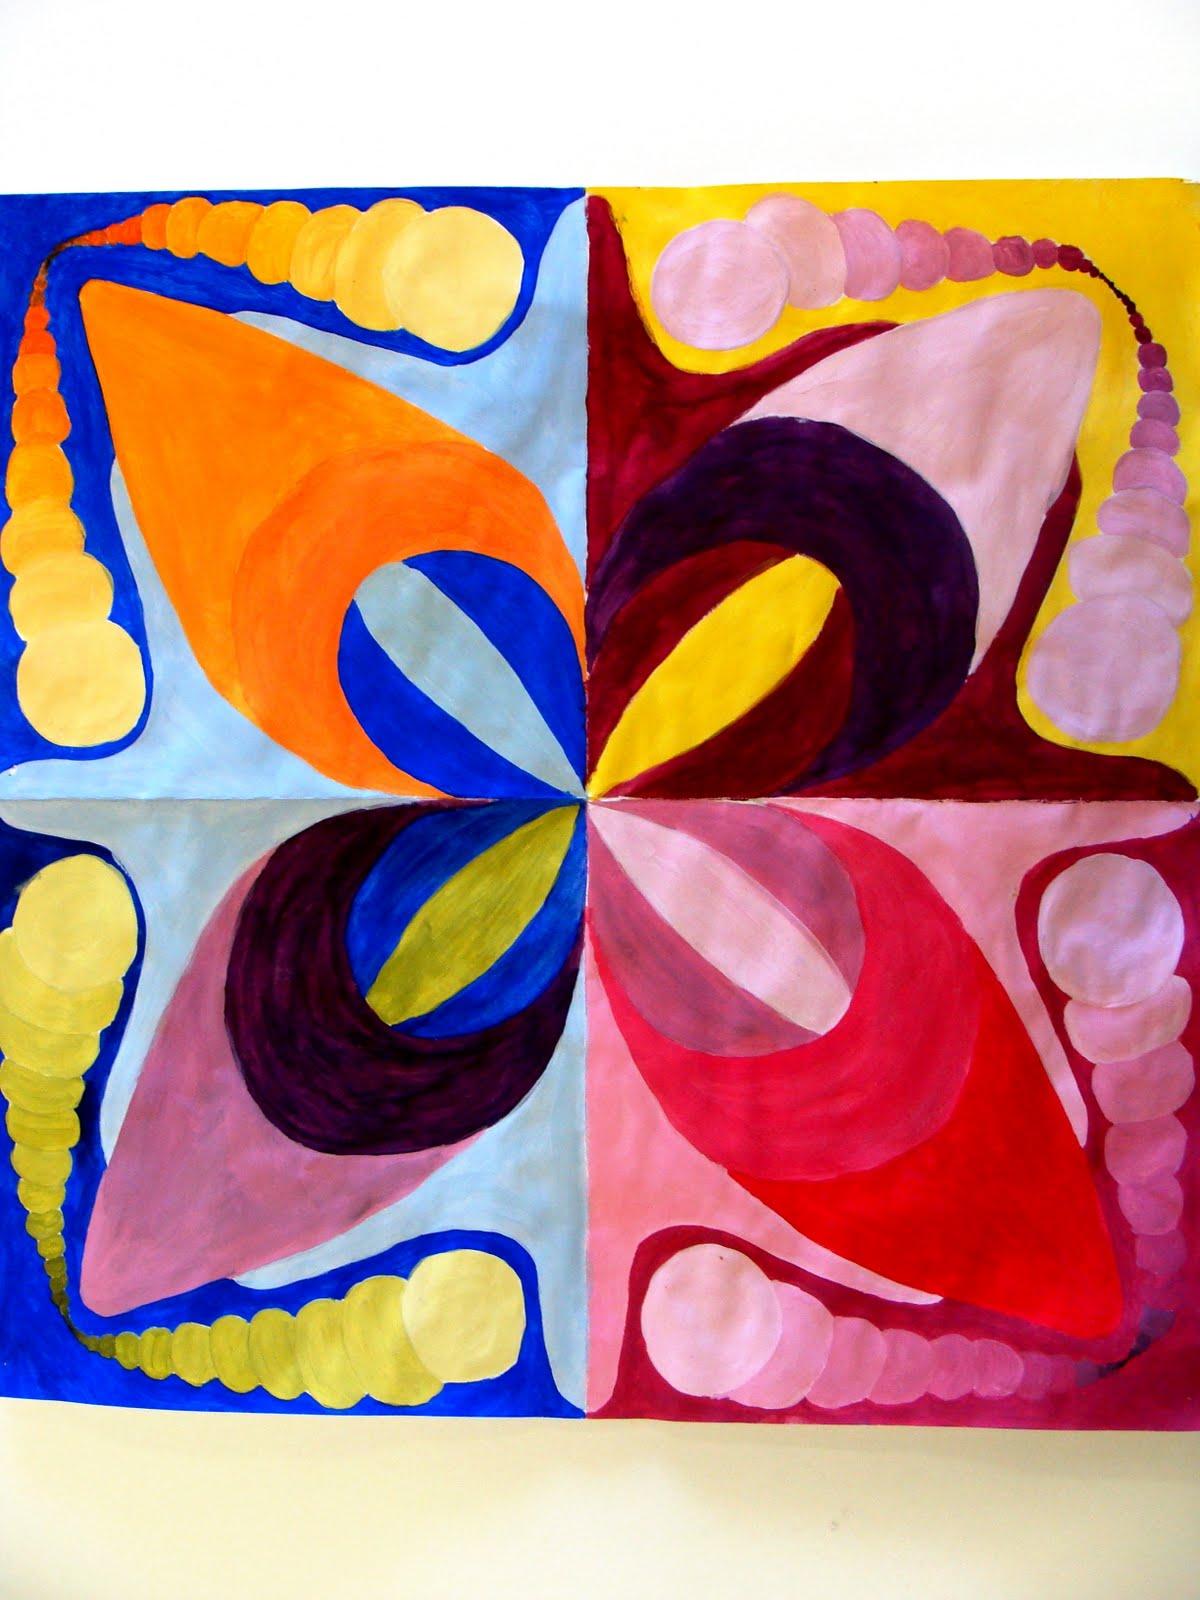 Color Theory And Balance